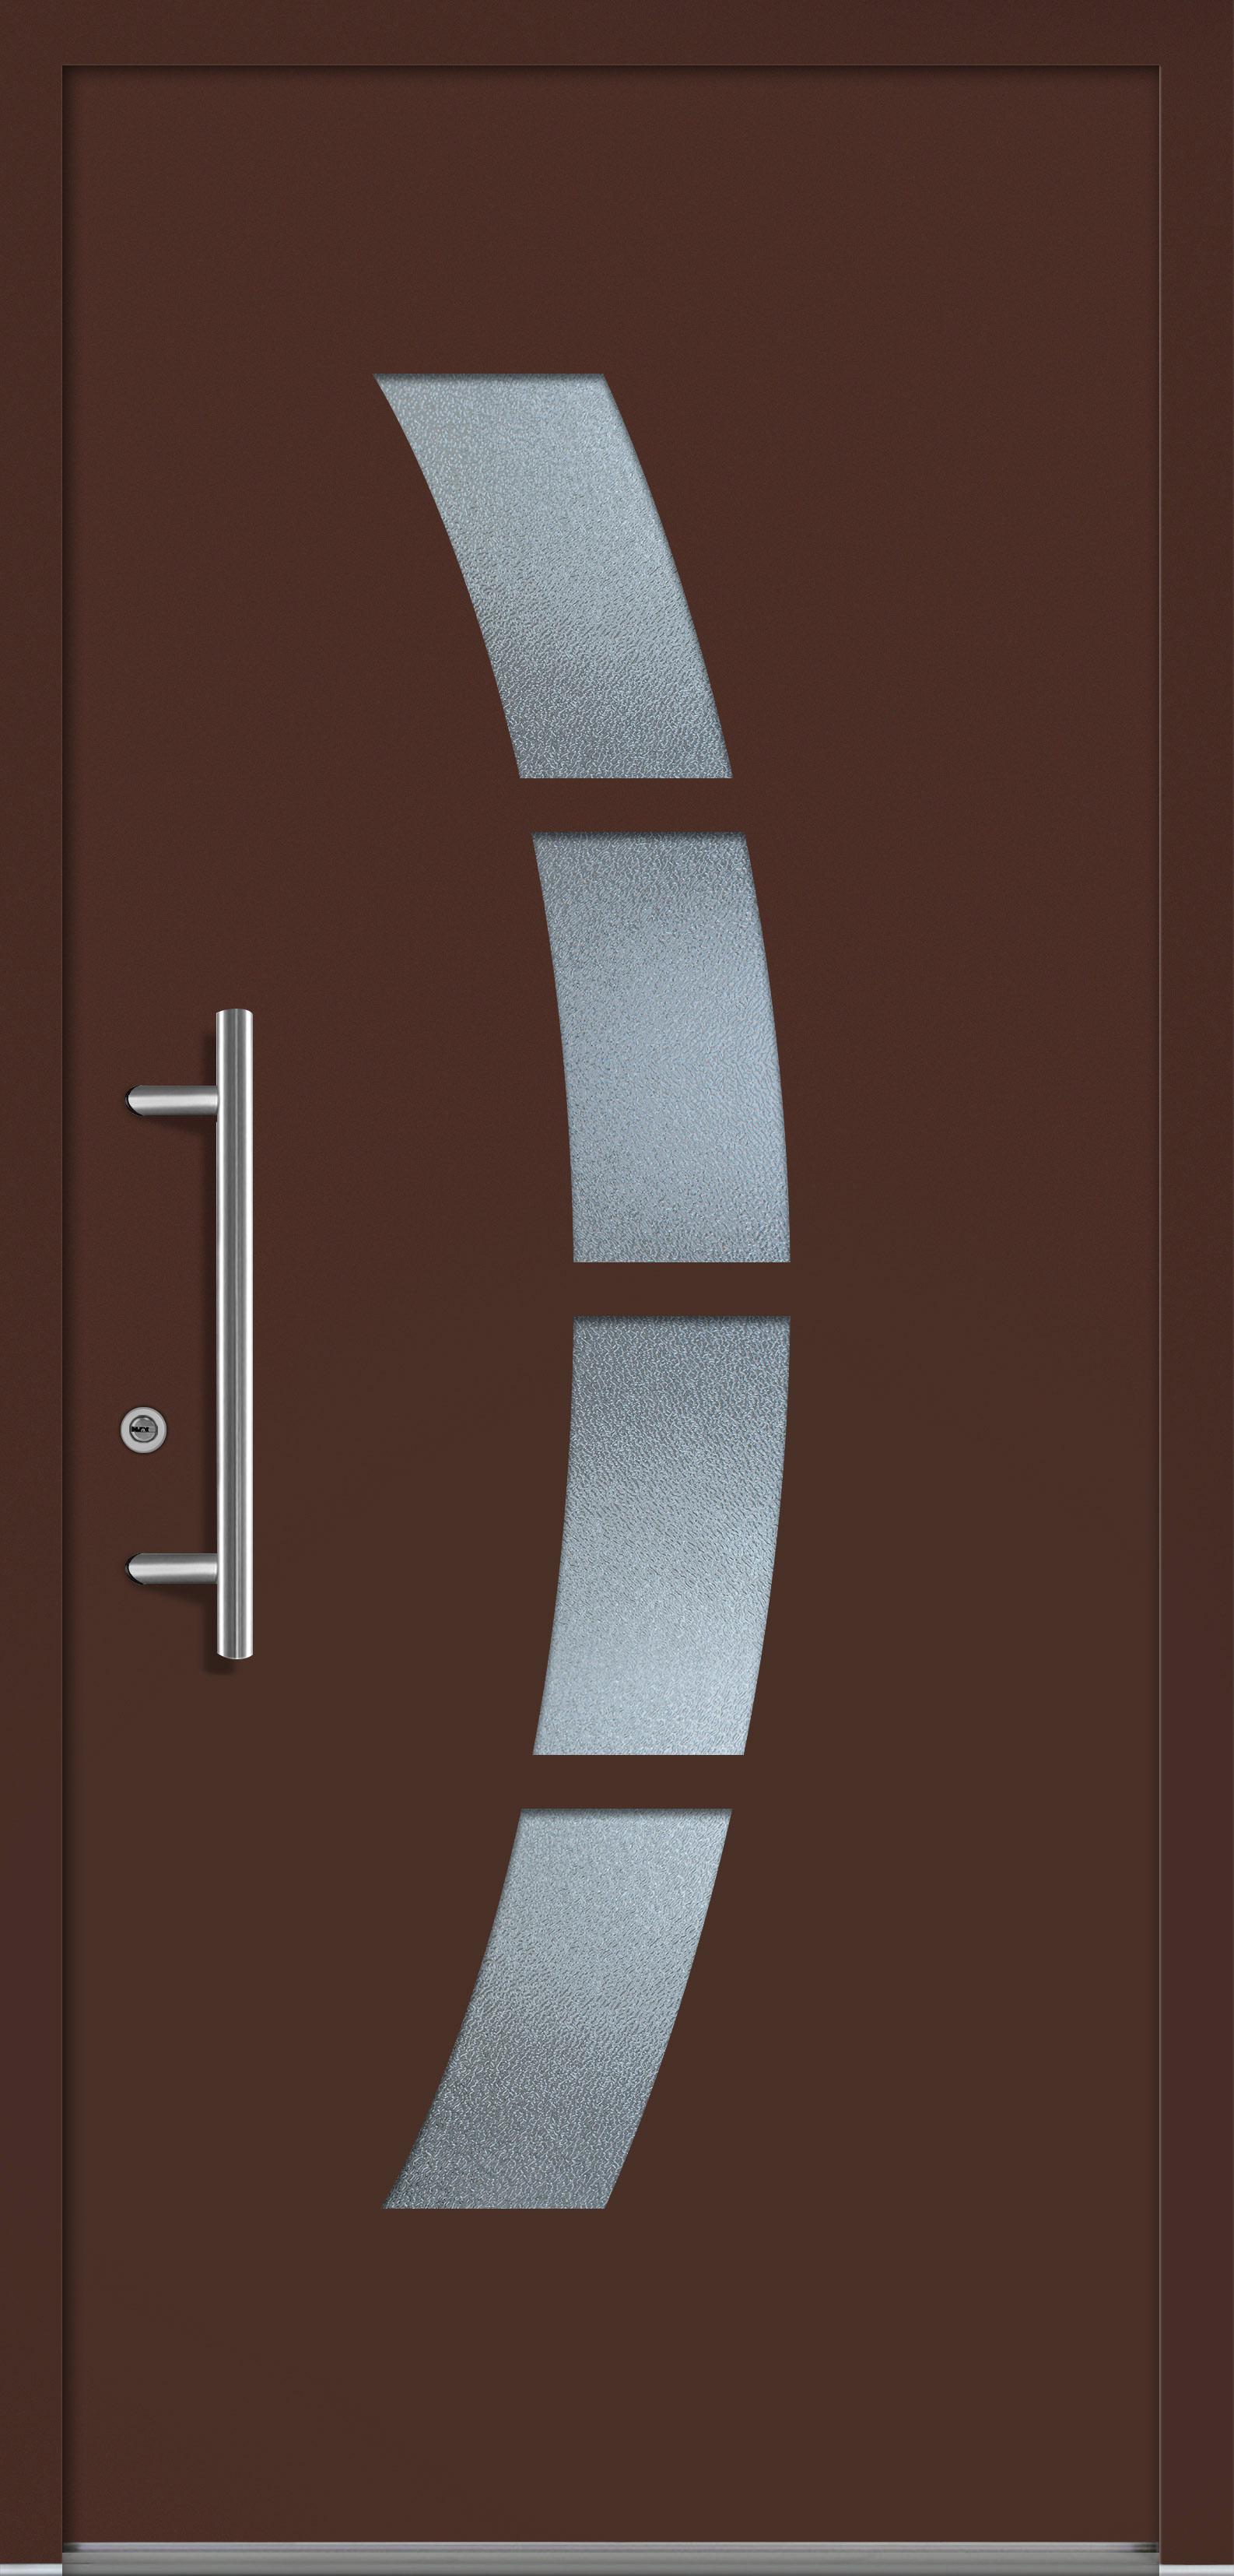 haust r meike elegance aluminiumt r eingangst r nebeneingangst r wohnungst r ebay. Black Bedroom Furniture Sets. Home Design Ideas